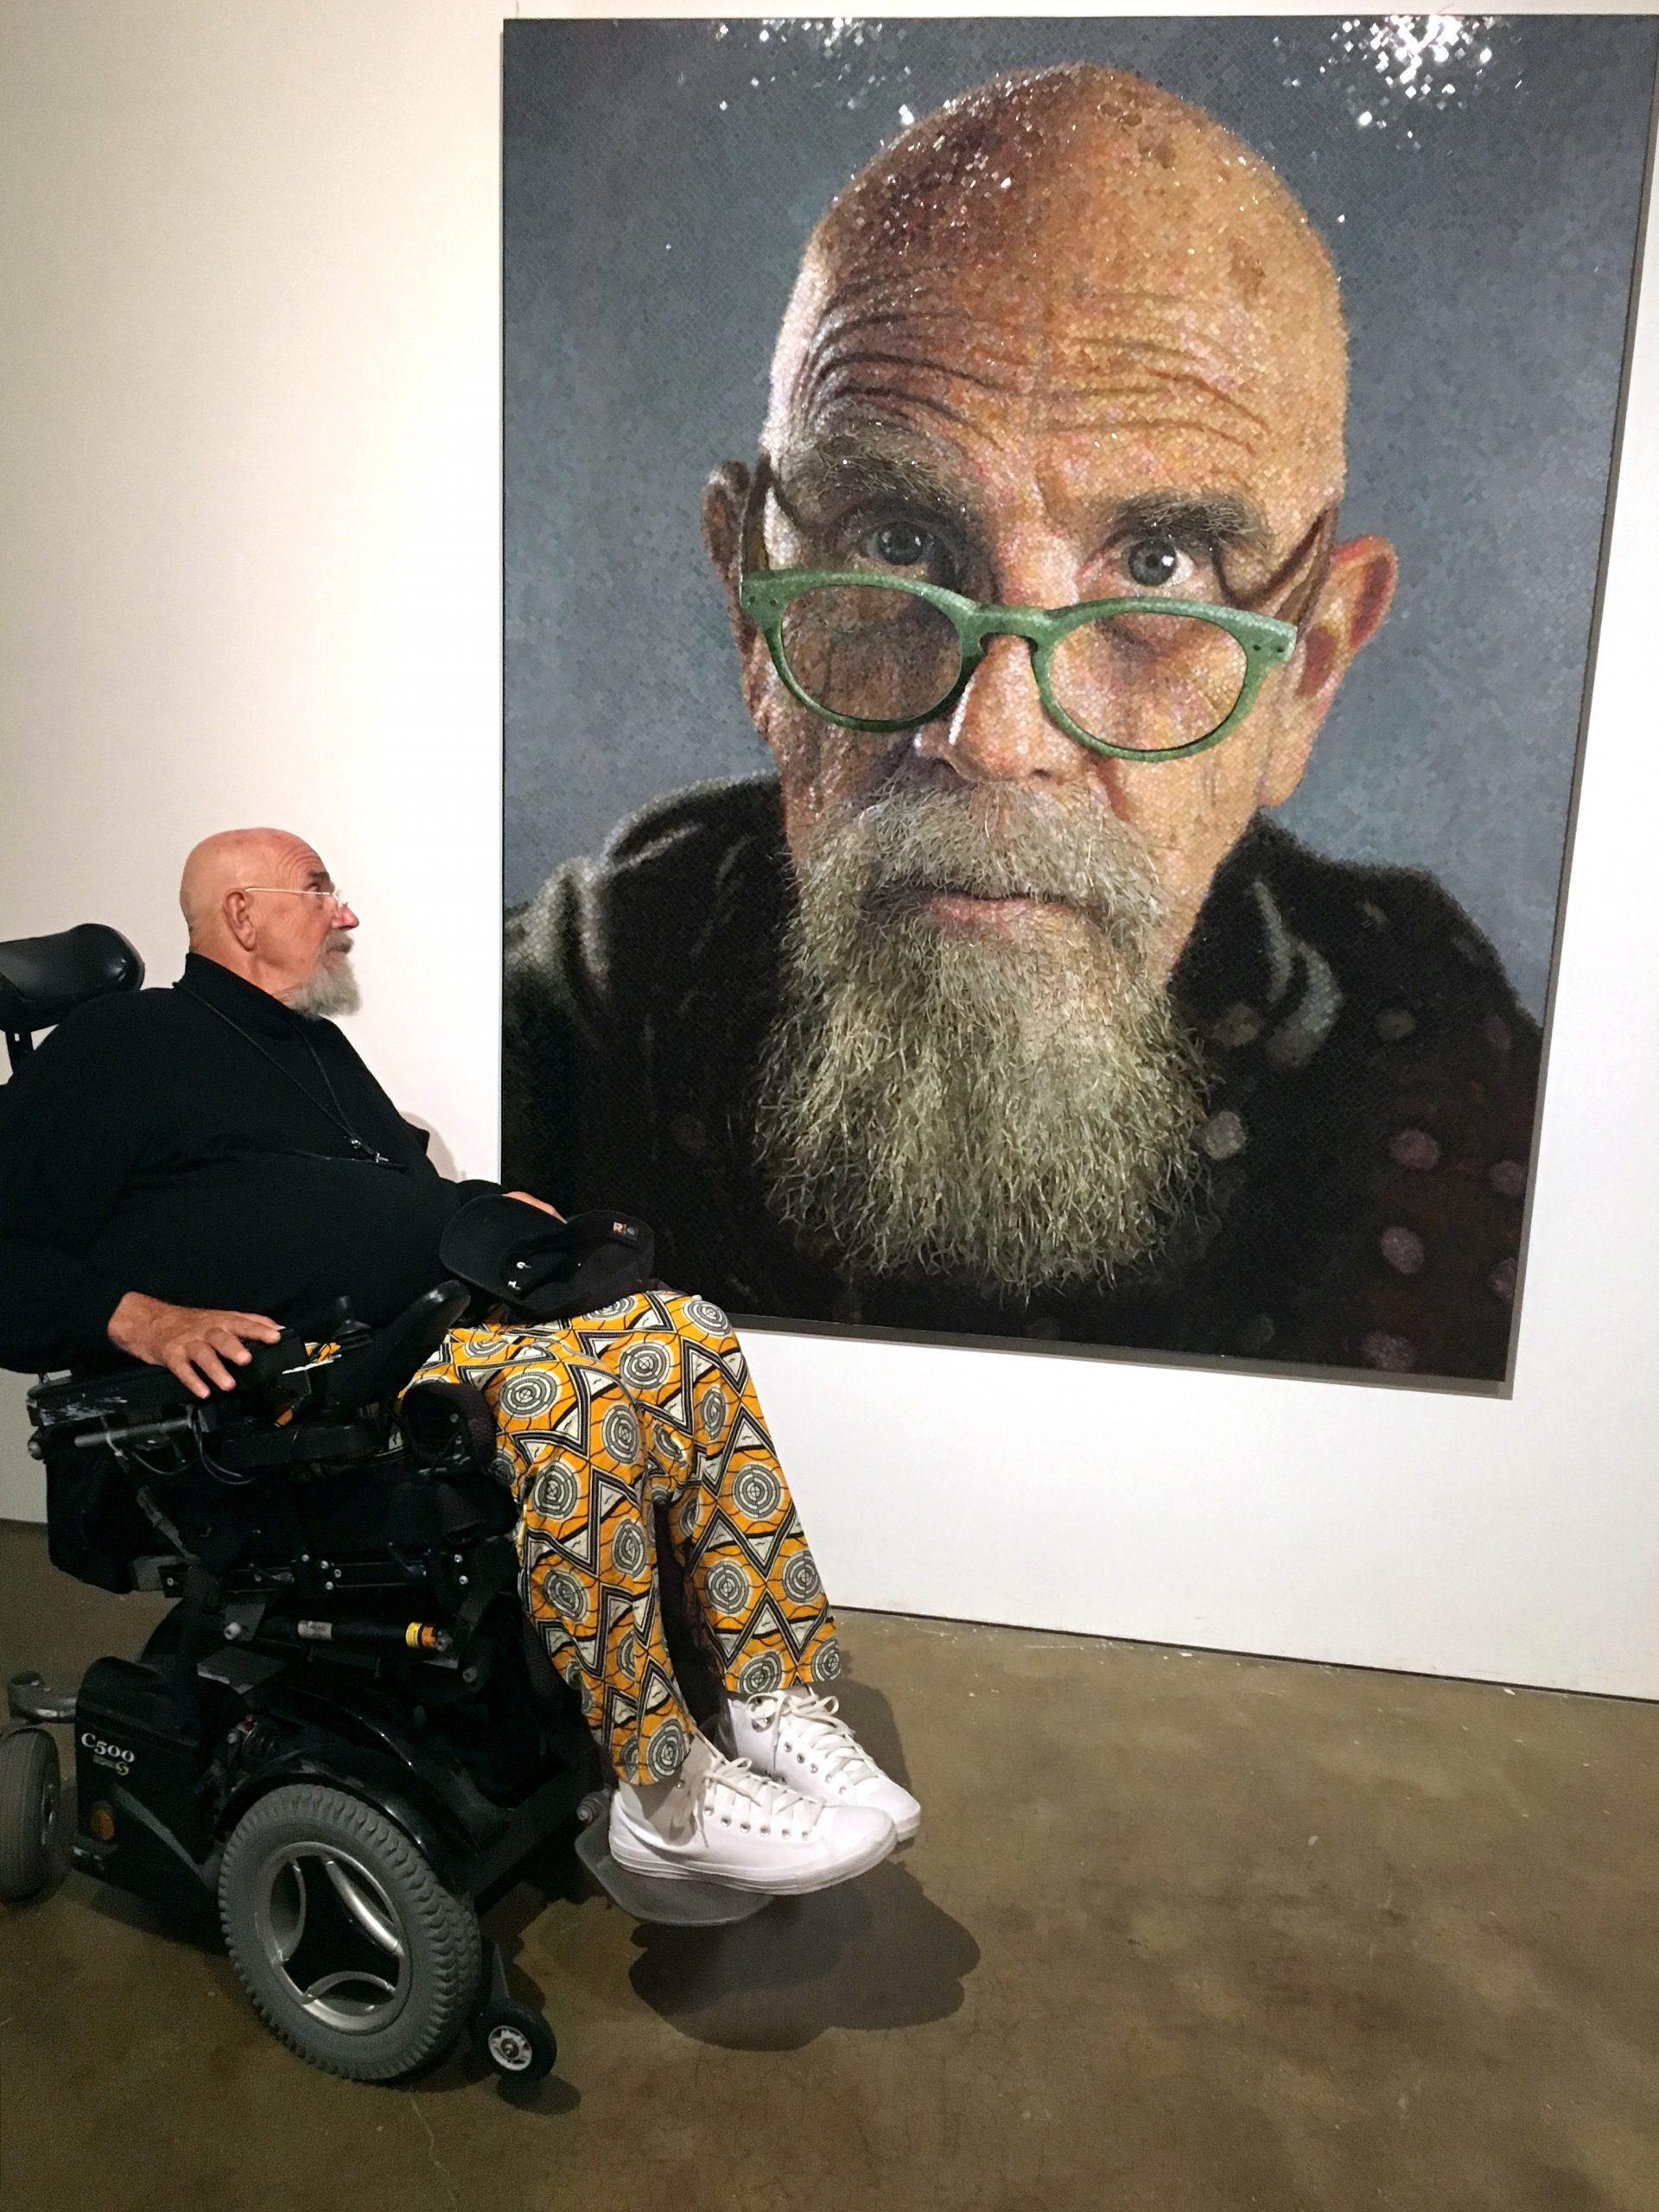 artist with self-portrait